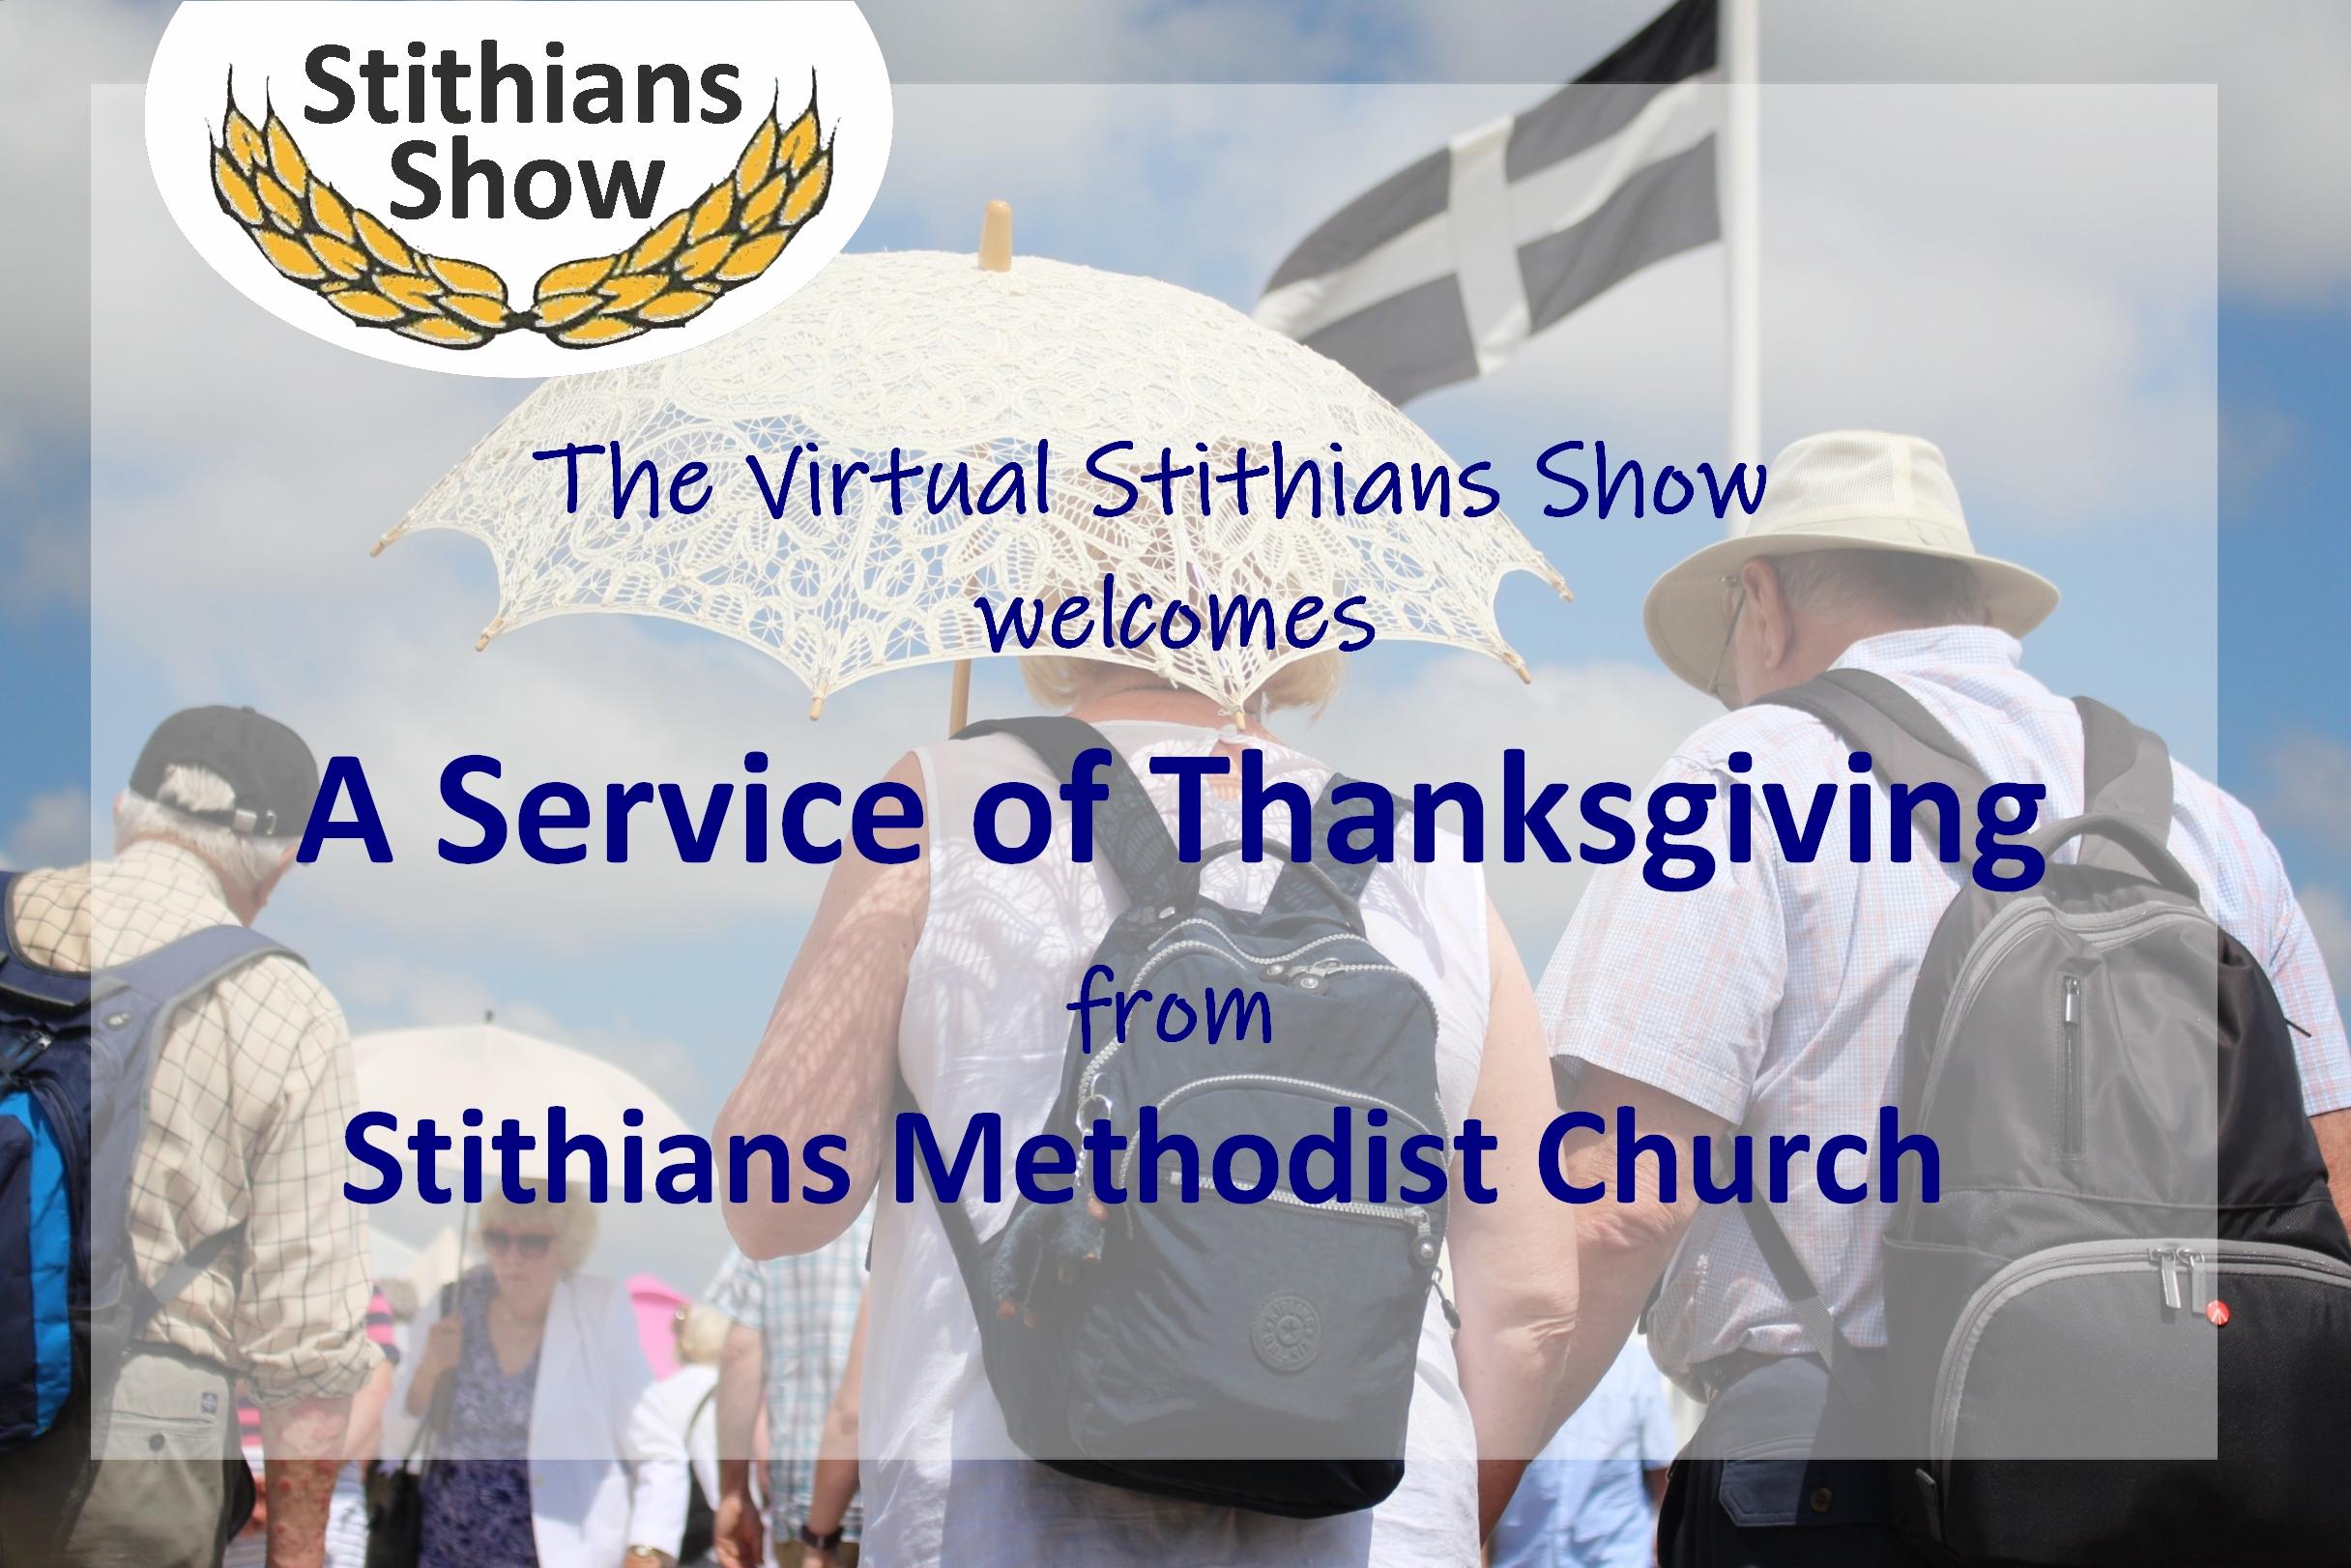 Stithians Methodist Church Thanksgiving Service